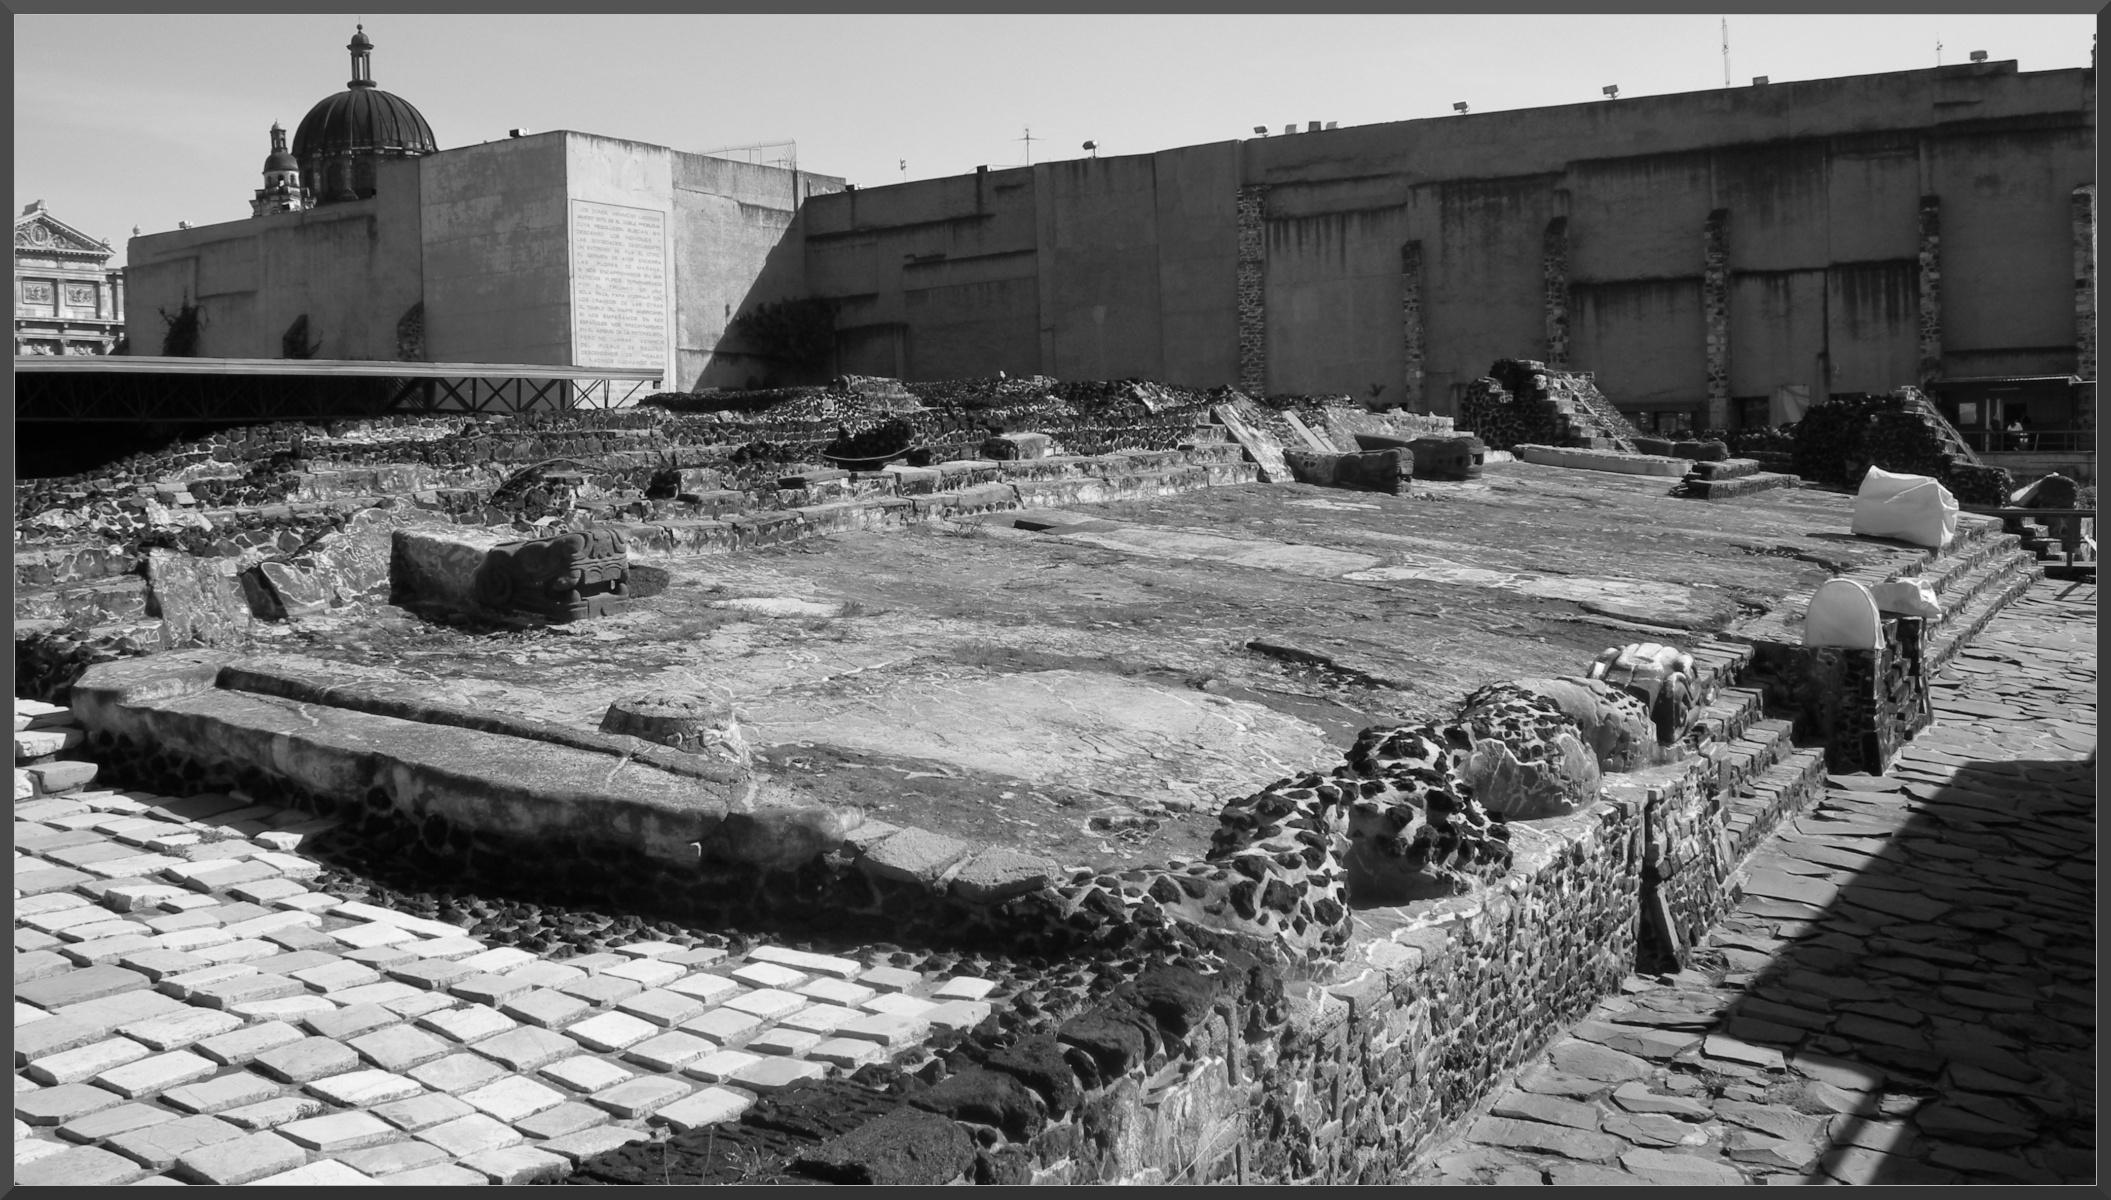 Ruins-of-the-Templo-Mayor-2007